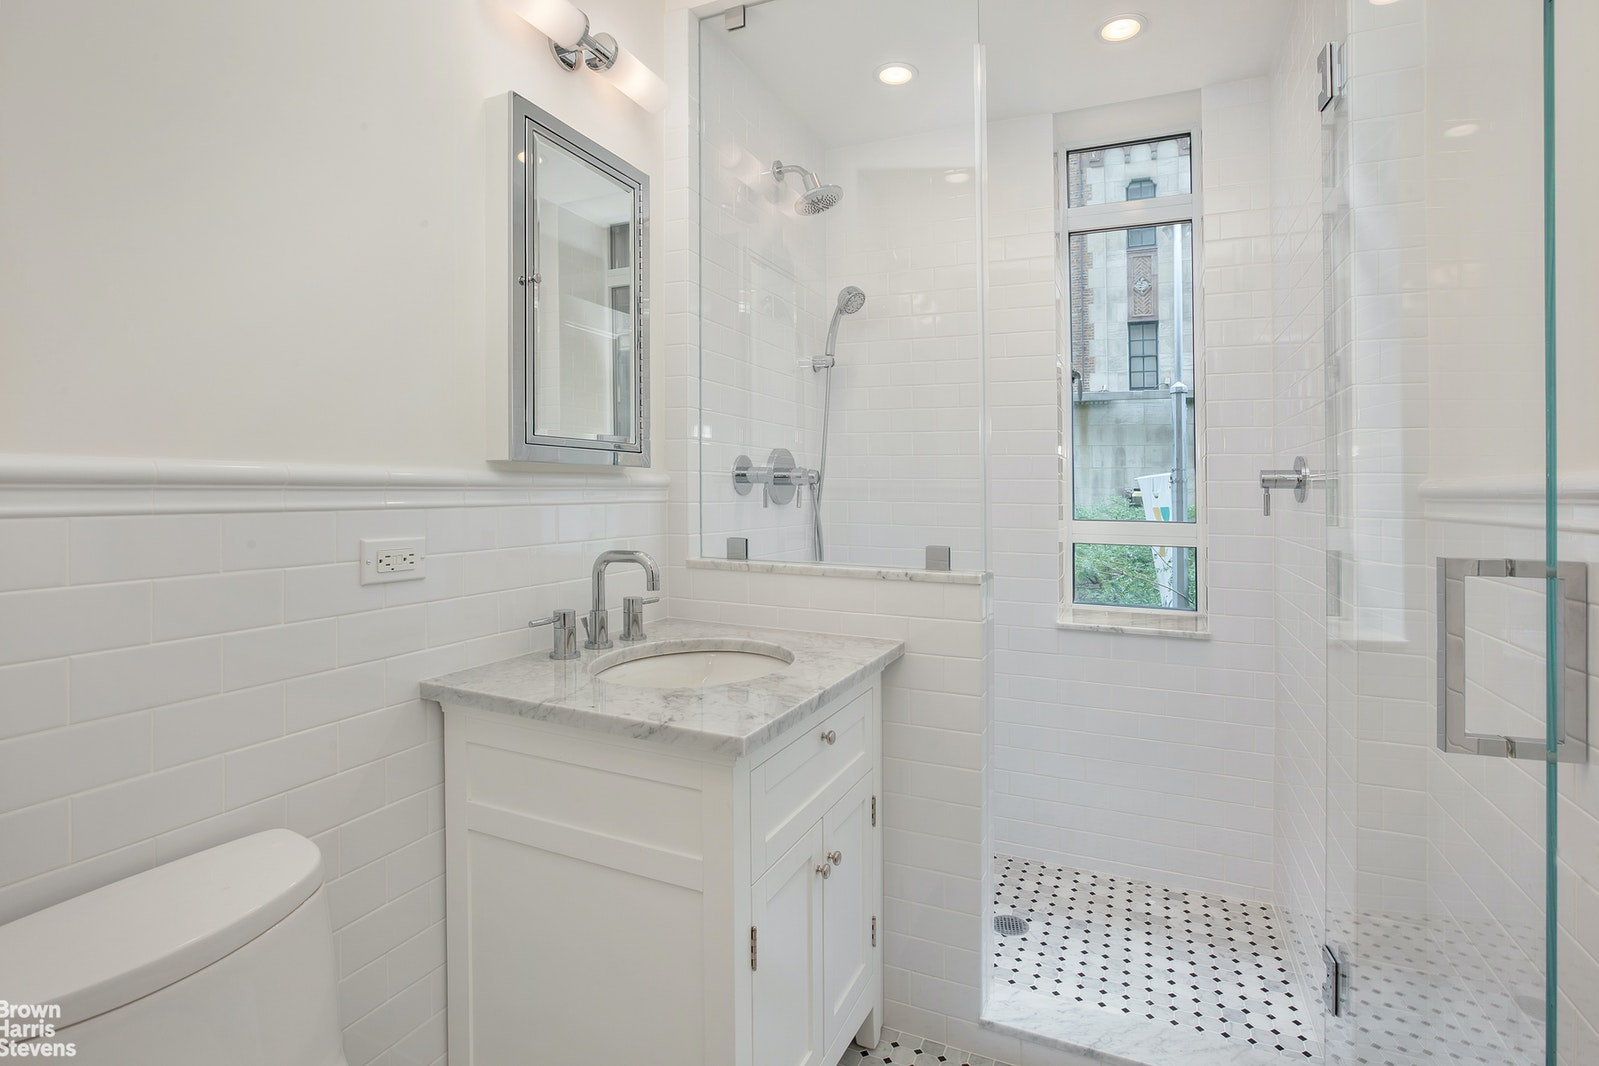 Apartment for sale at 25 Central Park West, Apt 2S